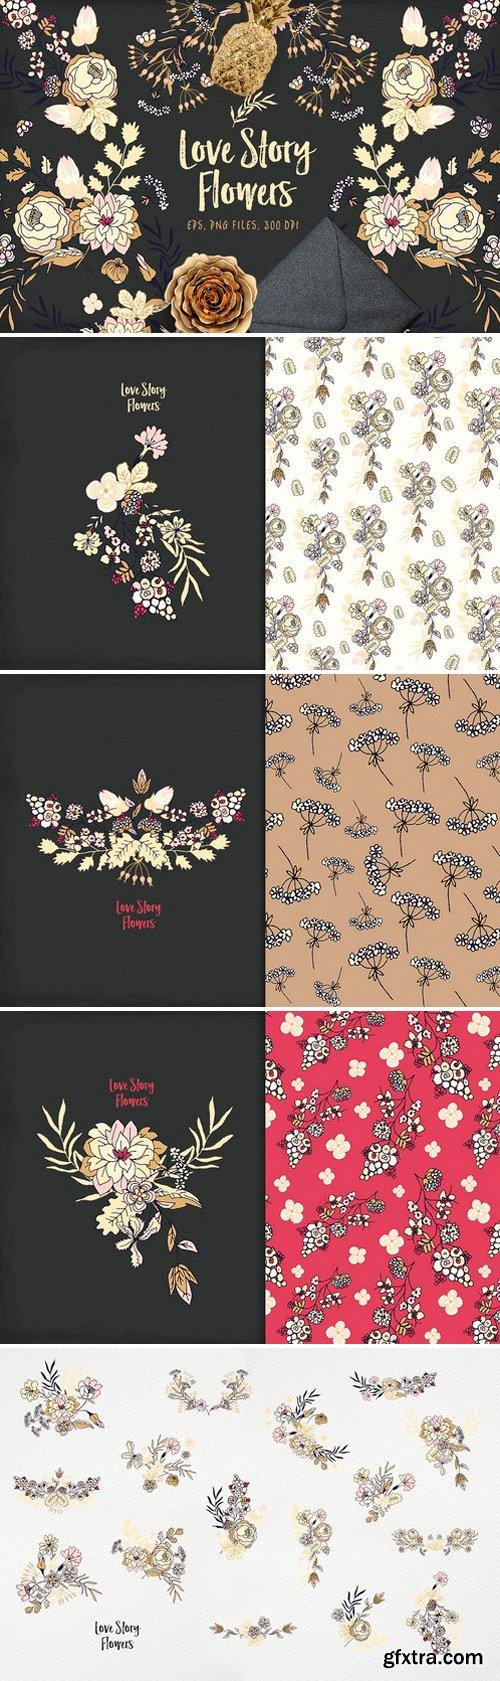 CM - Love Story Flowers 1165286